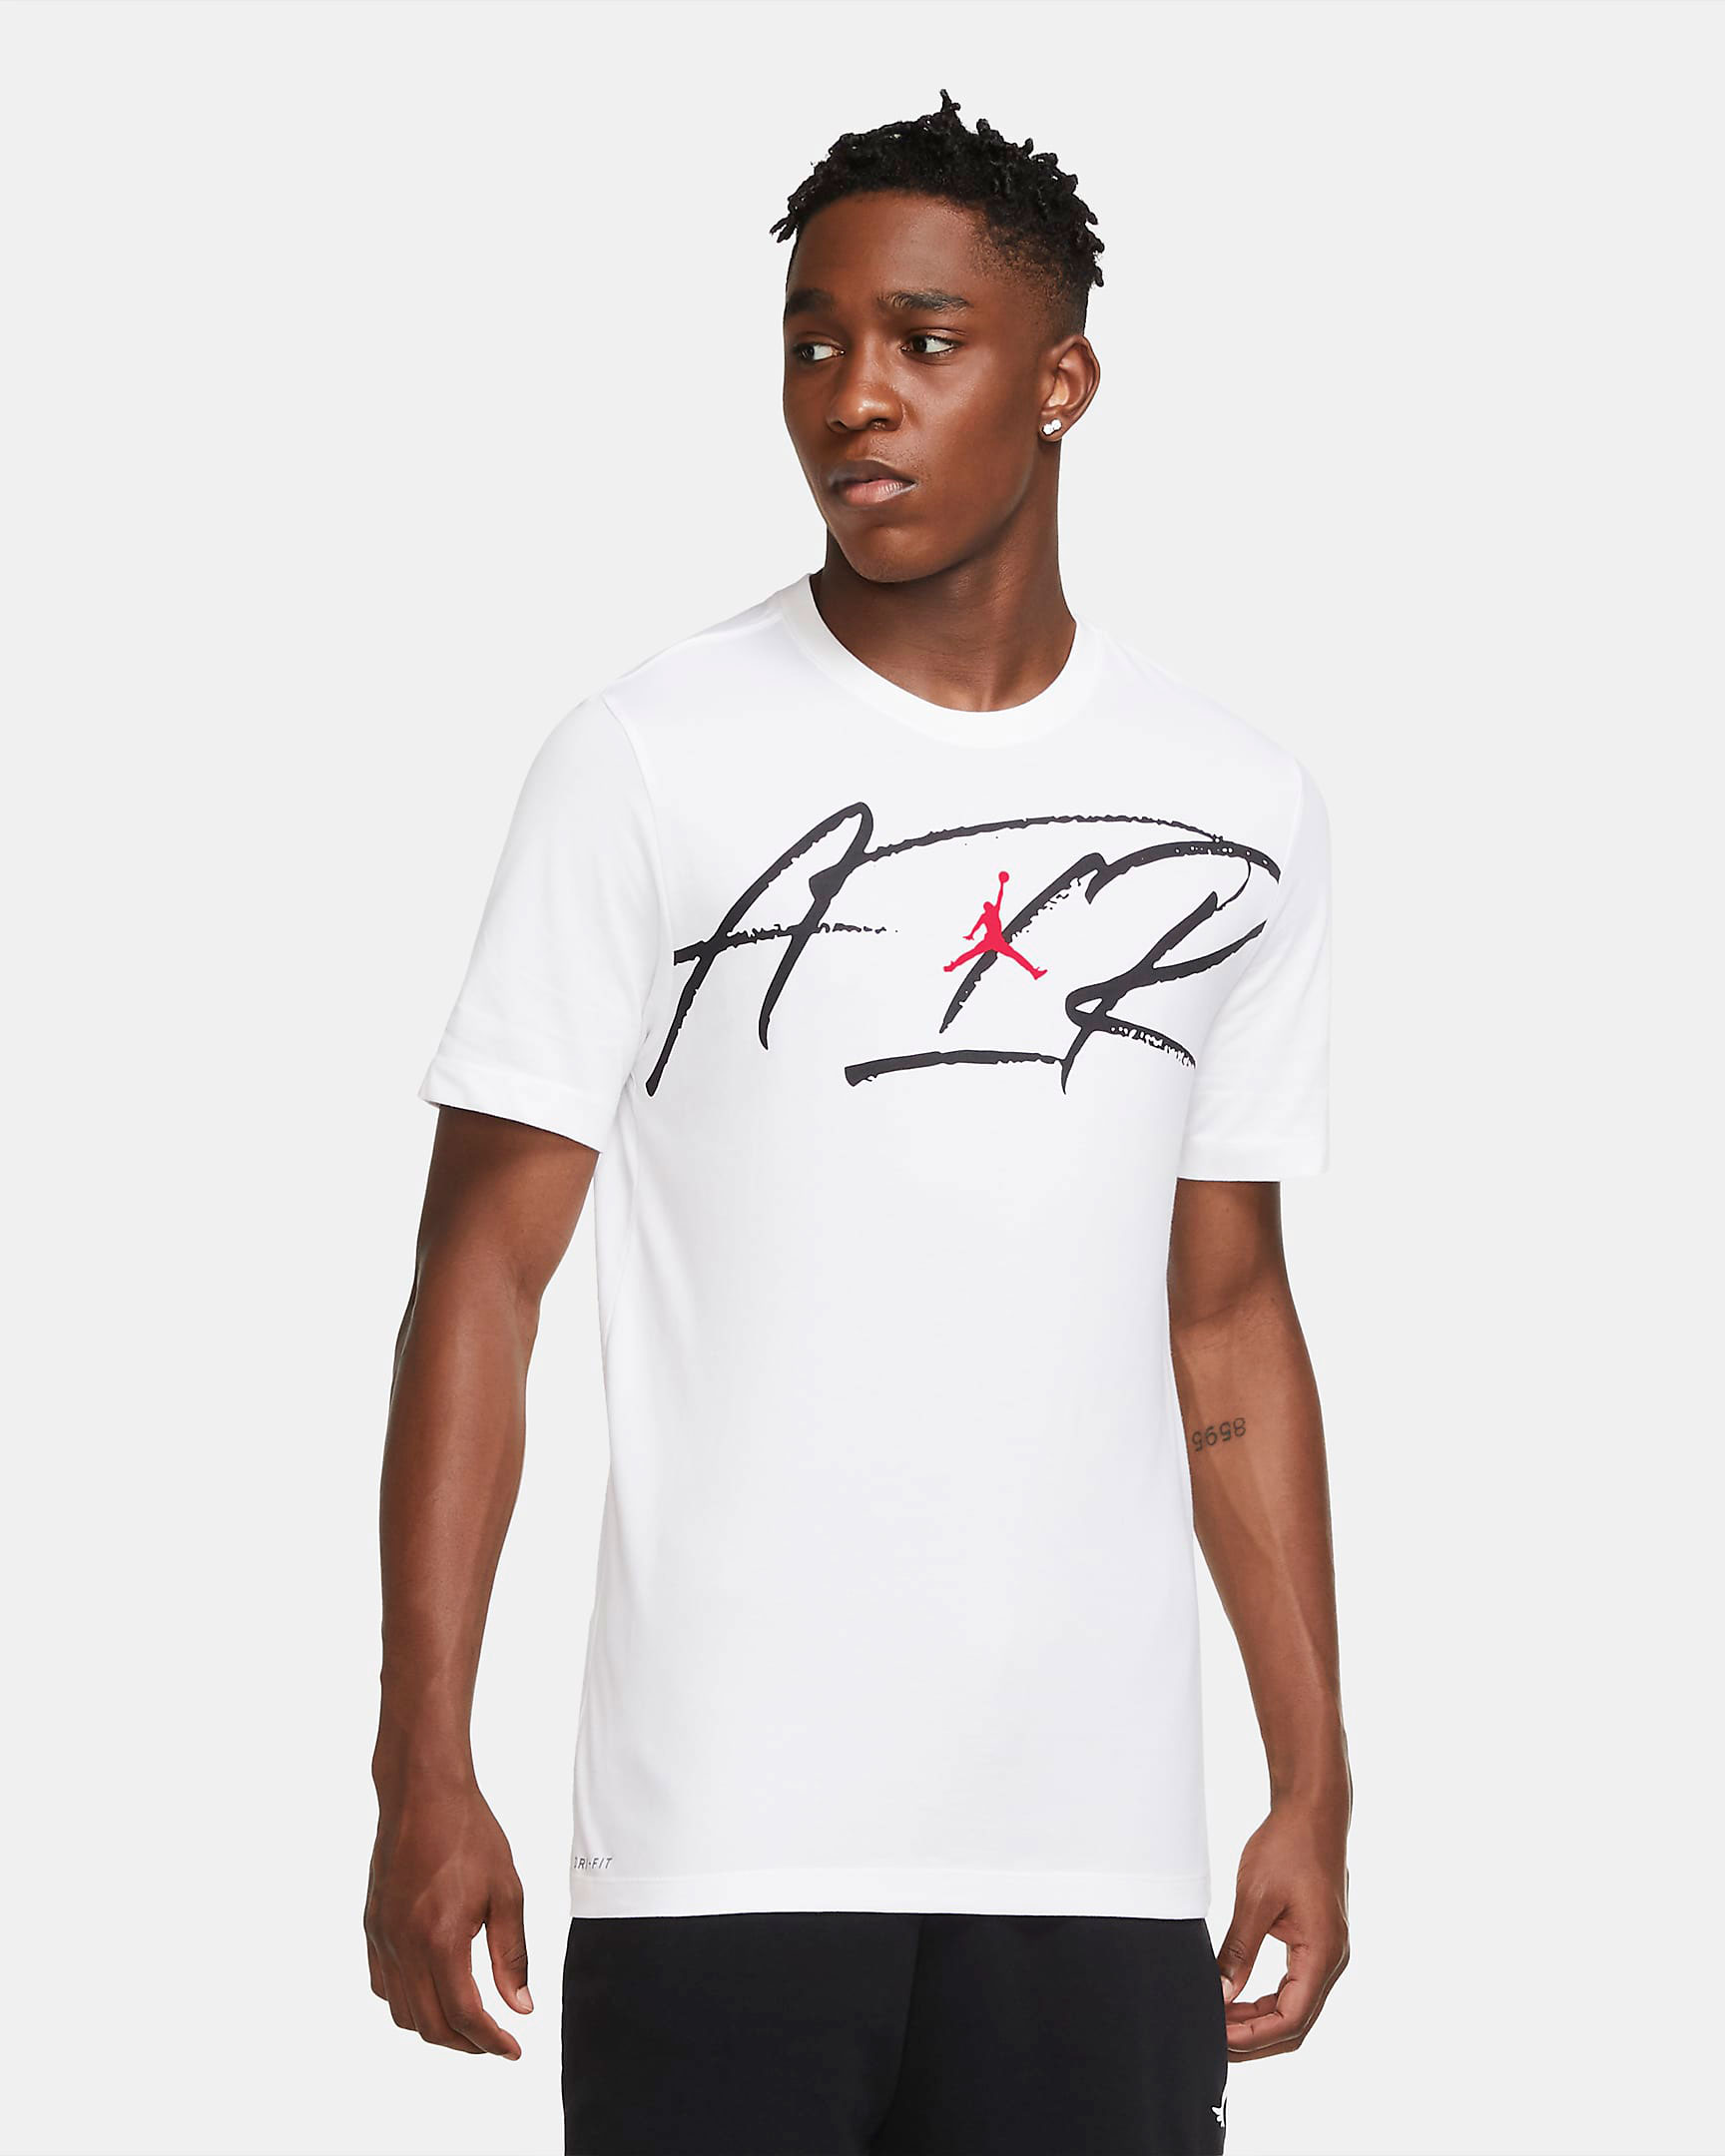 jordan-air-script-shirt-white-black-infrared